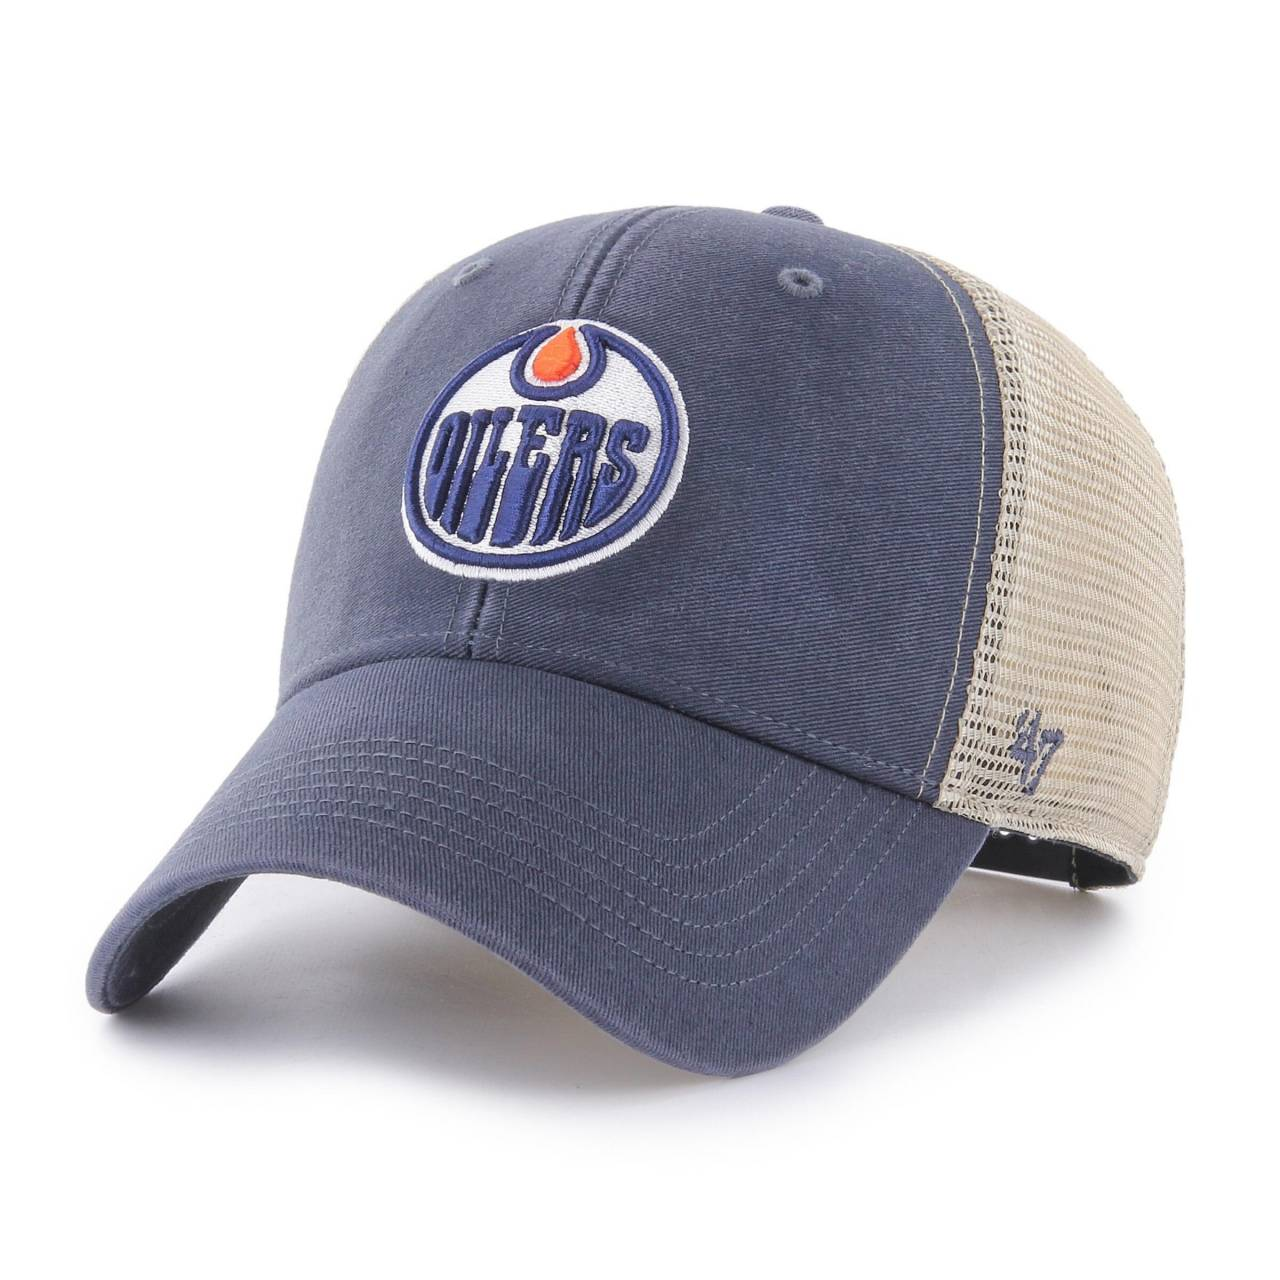 NHL EDMONTON OILERS FLAGSHIP WASH '47 MVP NAVY CAP